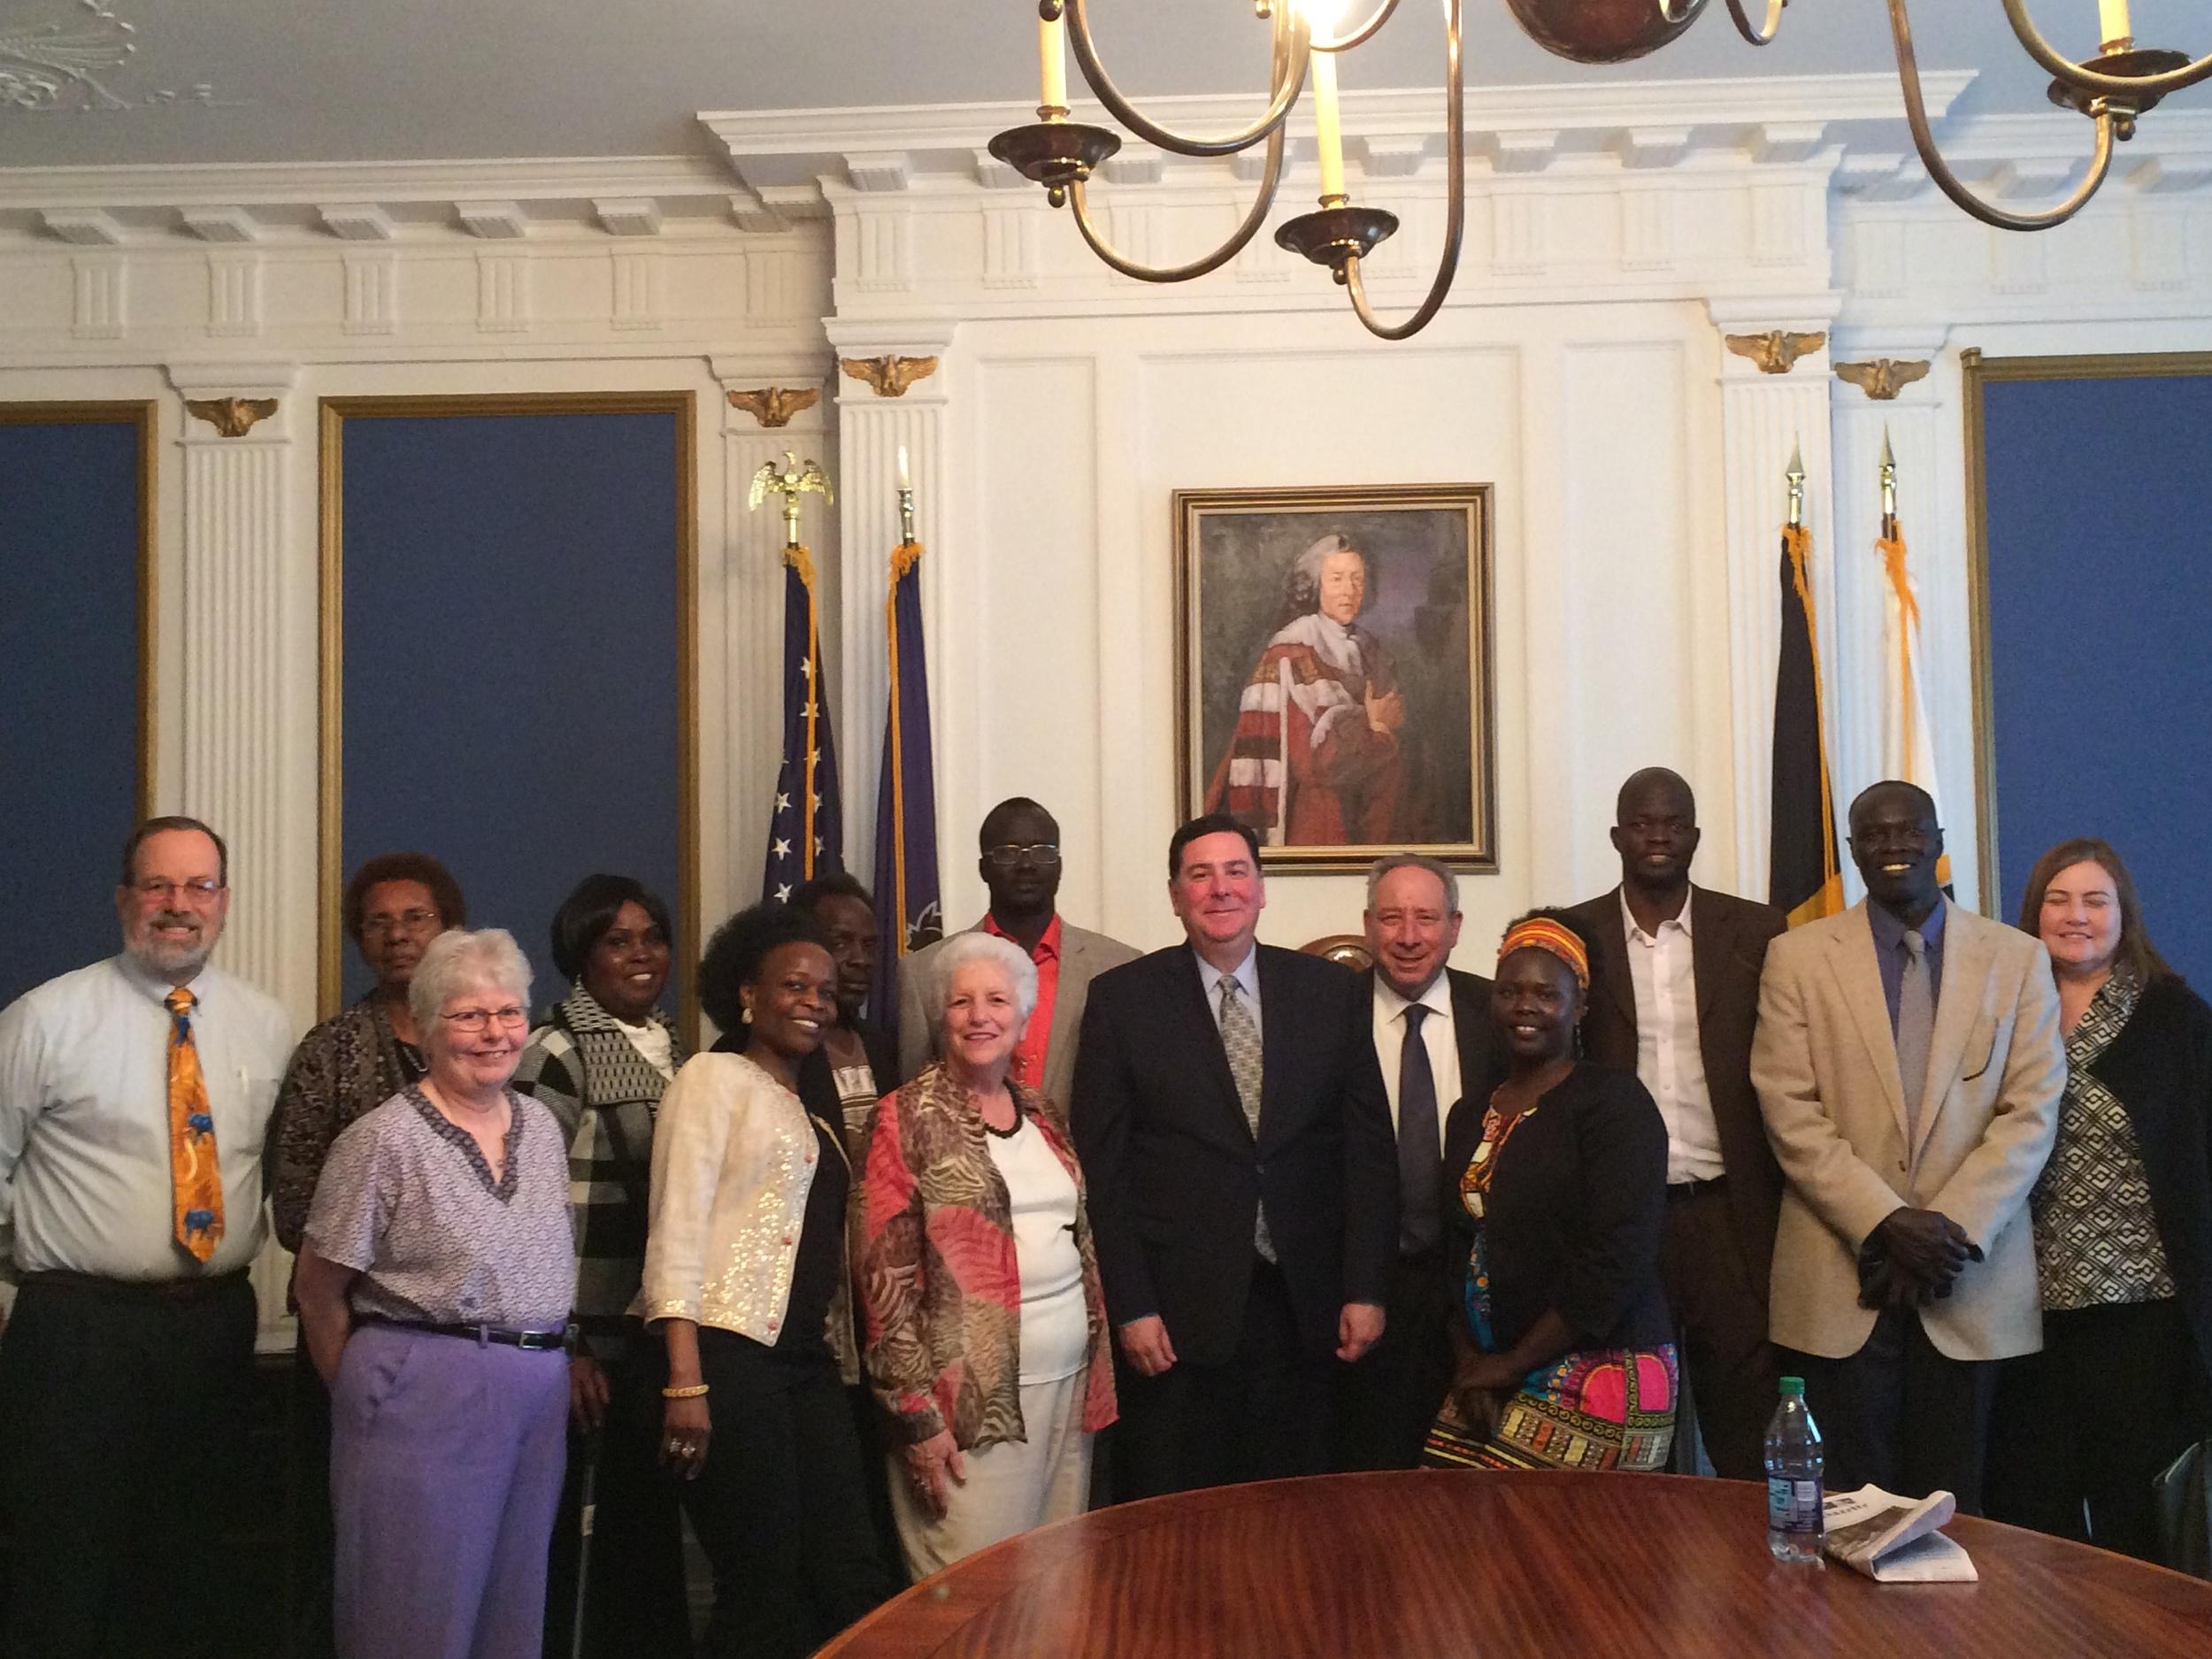 Meeting with Mayor Peduto